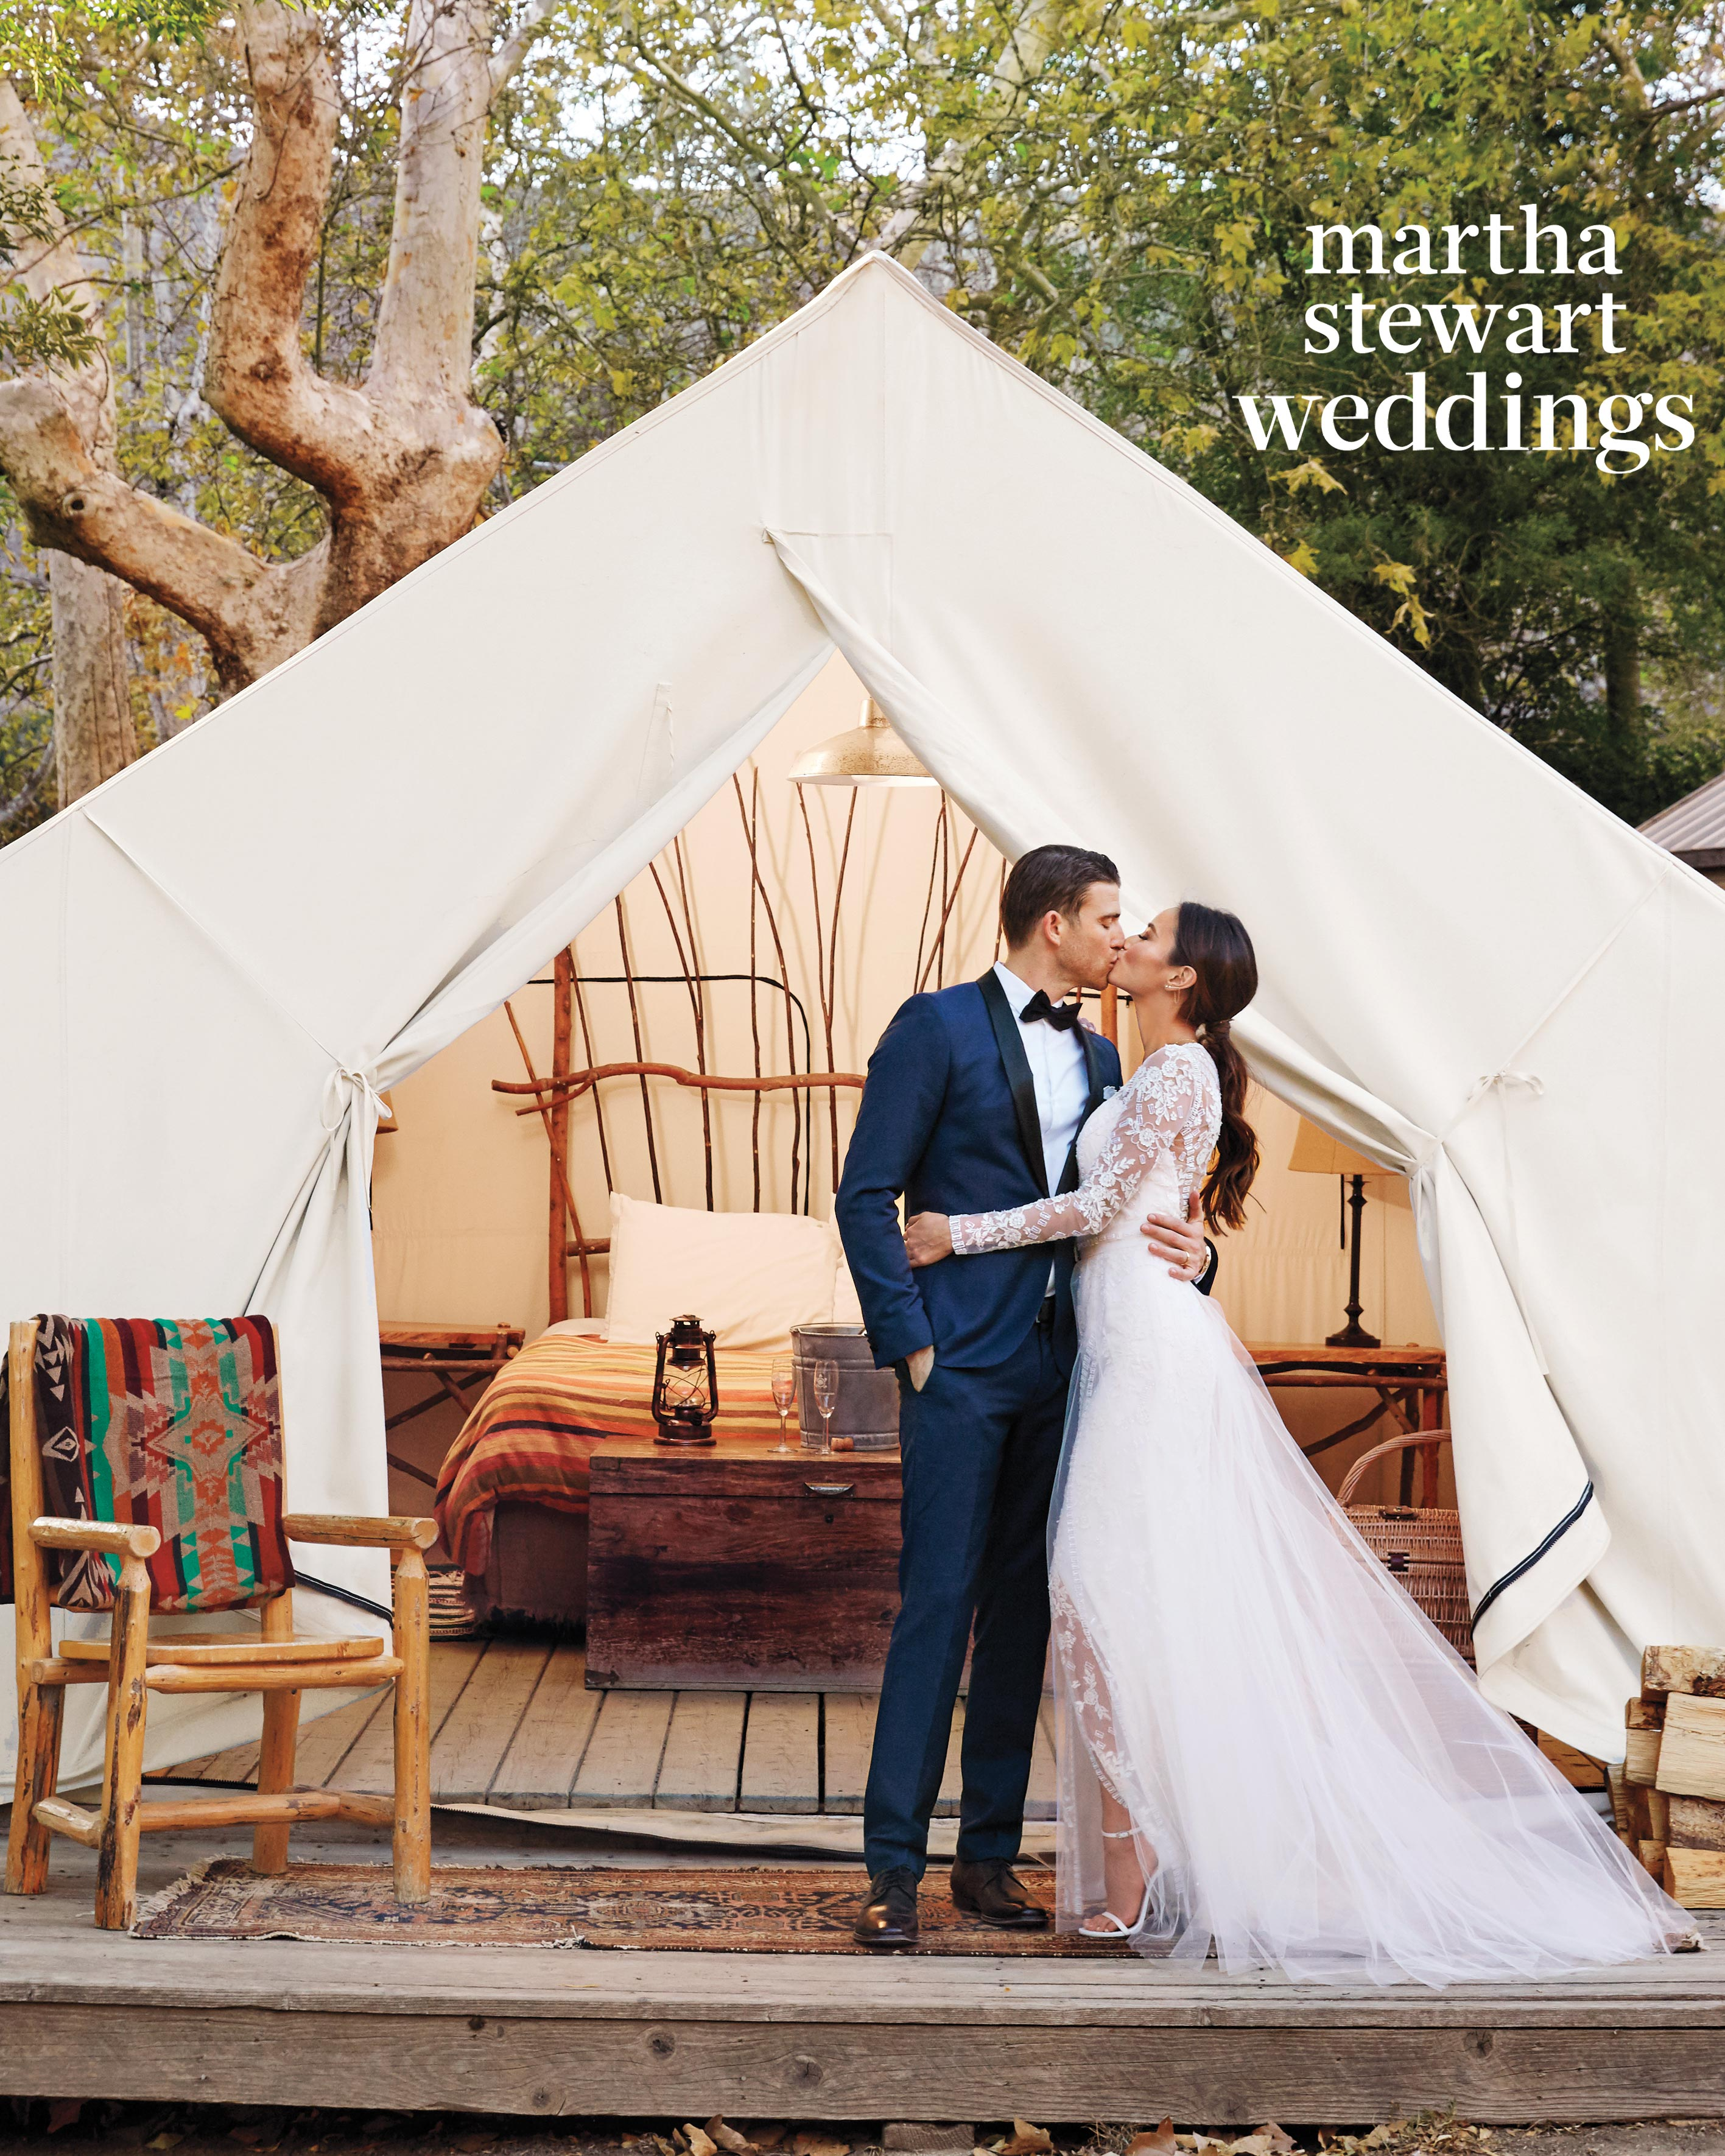 jamie-bryan-wedding-24-tent-couple-kiss-3110-d112664.jpg